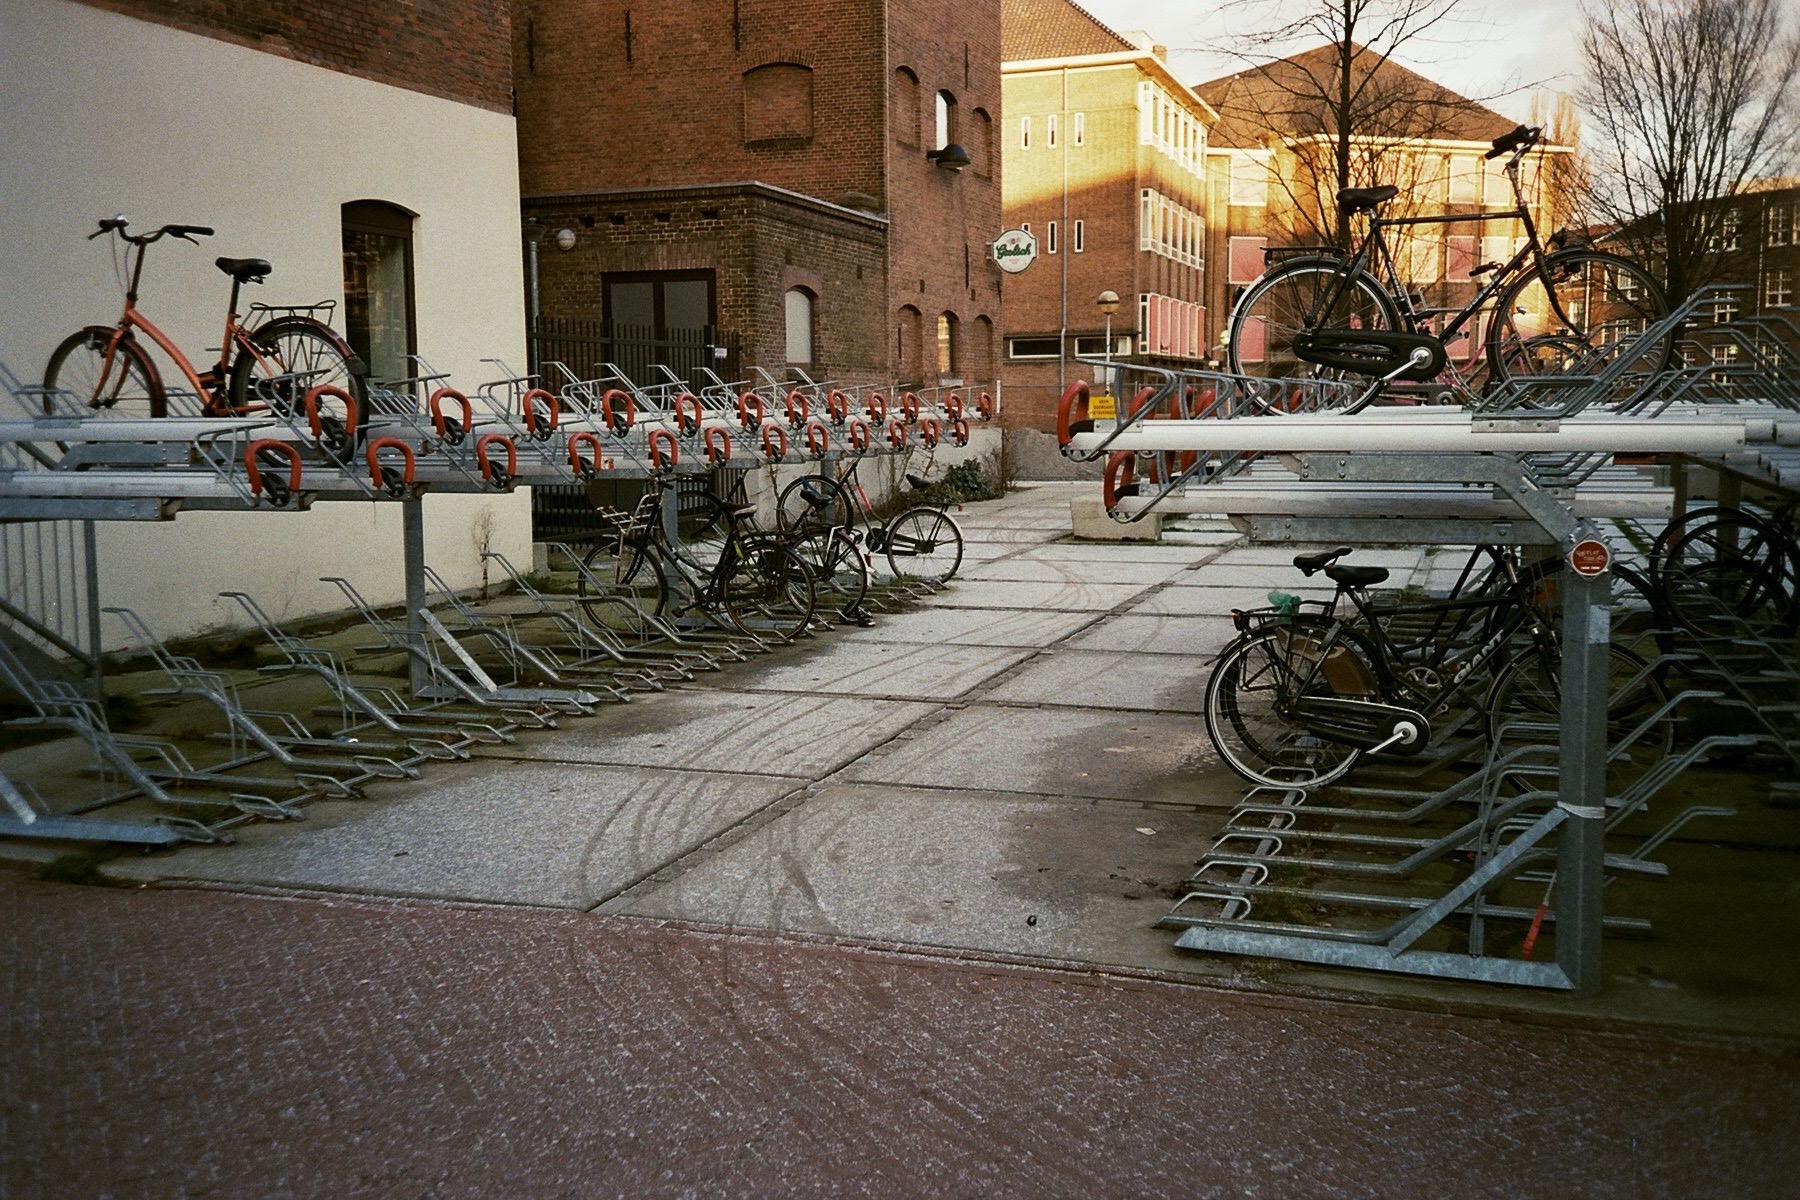 zoe-dunster_university-of-amsterdam-1155-3